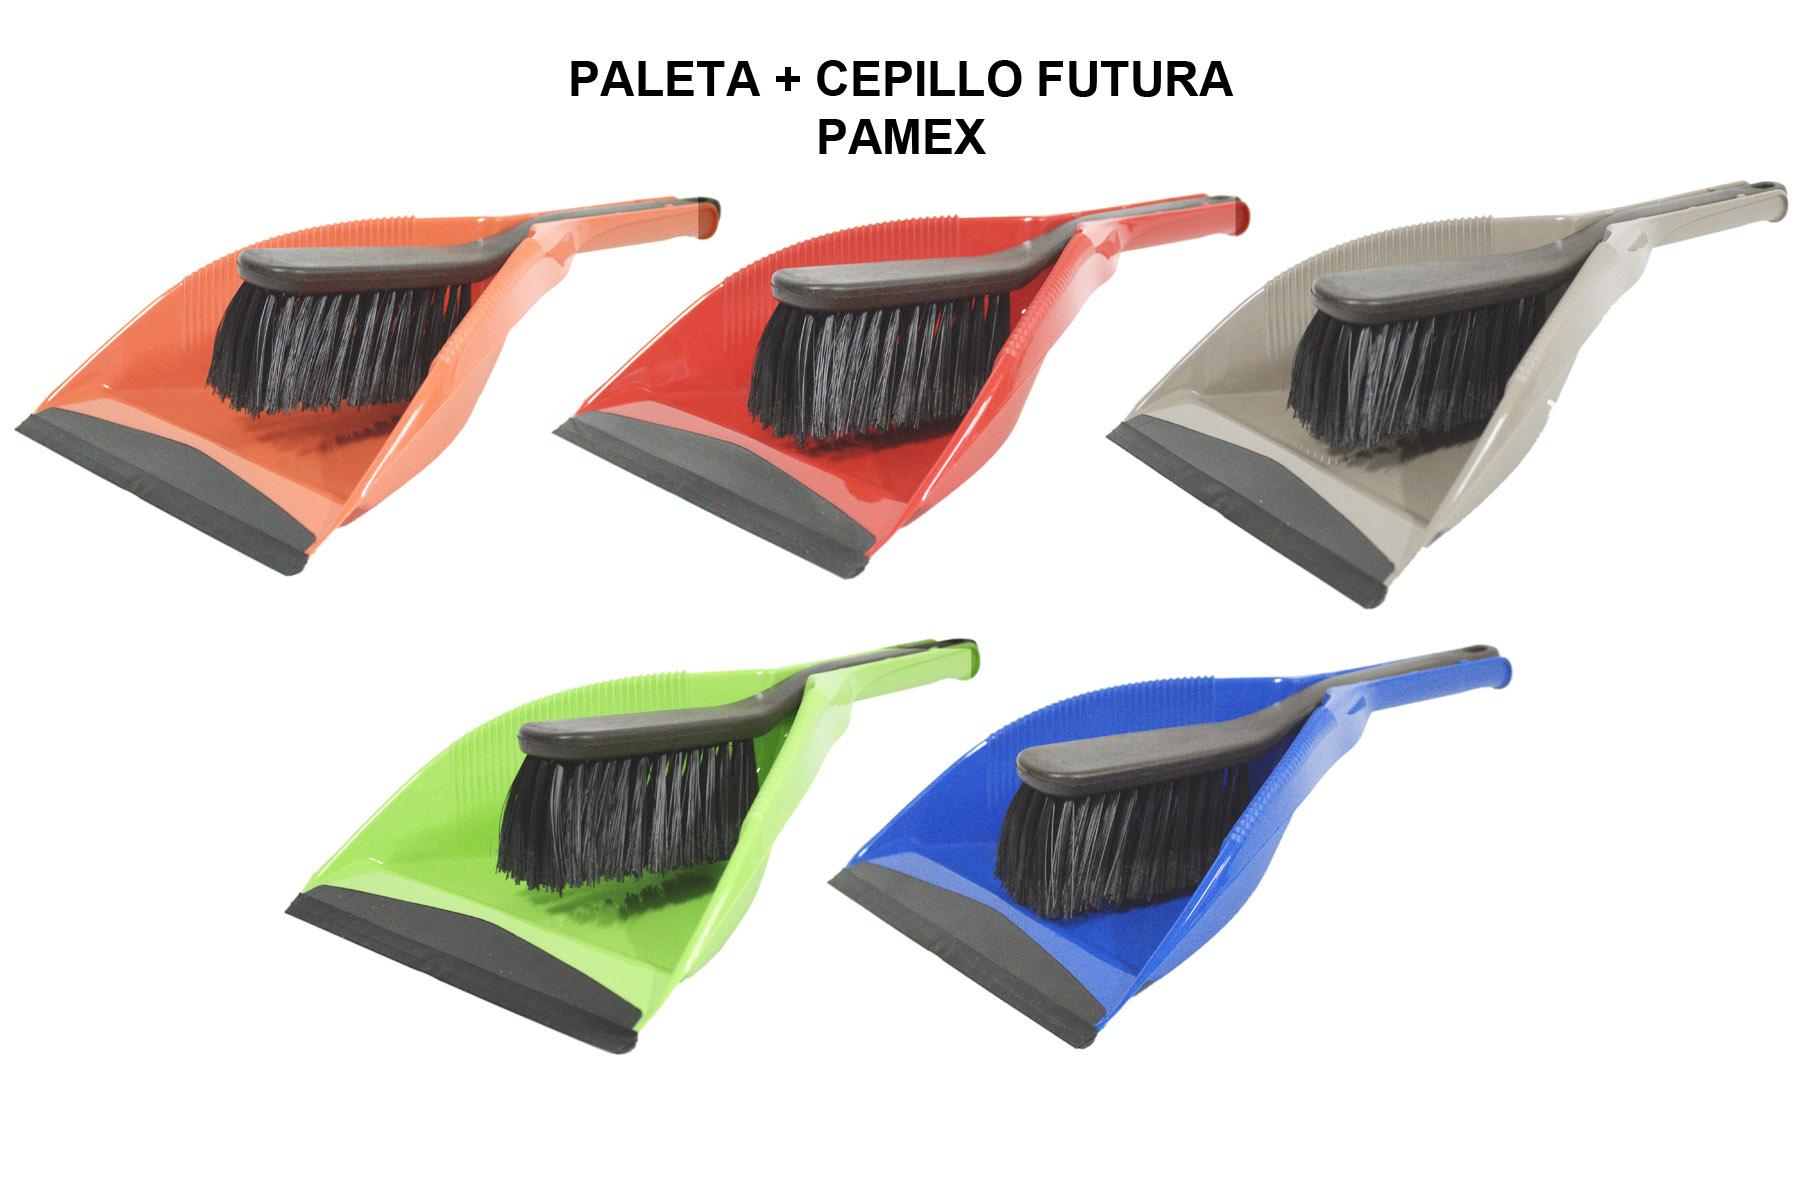 PALETA + CEPILLO FUTURA PAMEX